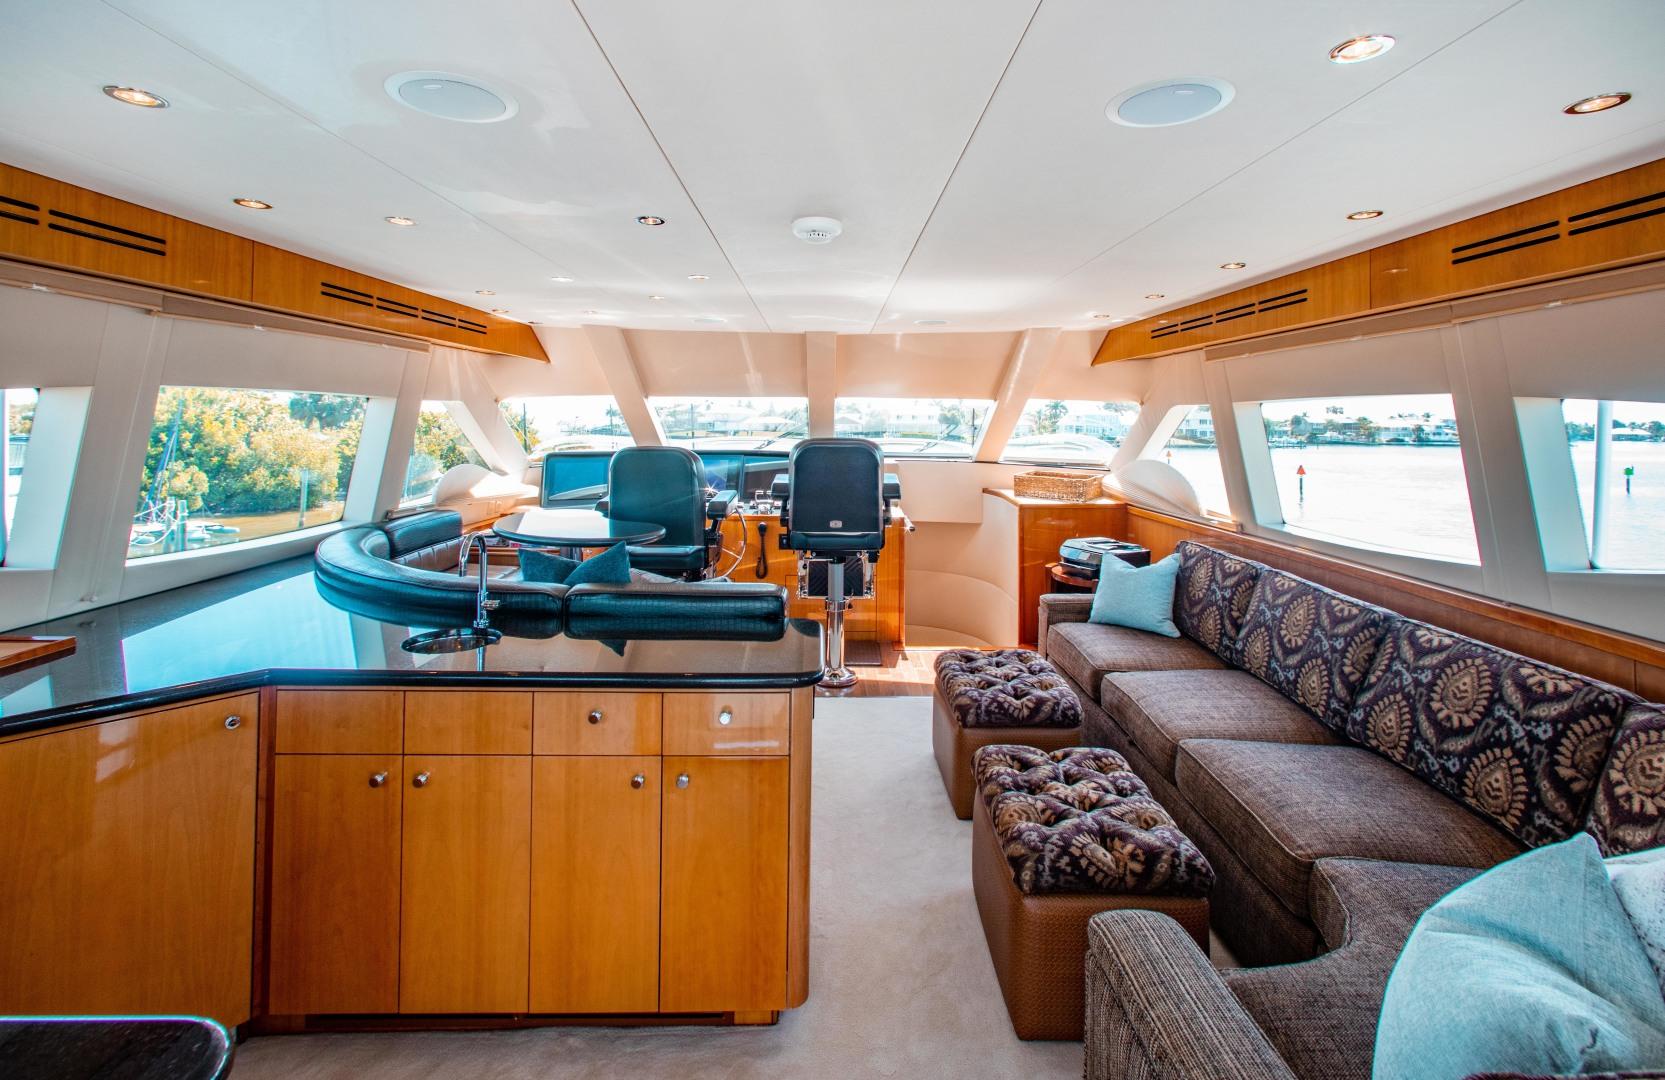 Hatteras-80 Motor Yacht 2008-Galati Yacht Sales Trade Anna Maria-Florida-United States-2008 Hatteras 80 Motor Yacht  Galati Yacht Sales Trade  Skybridge-1466220 | Thumbnail